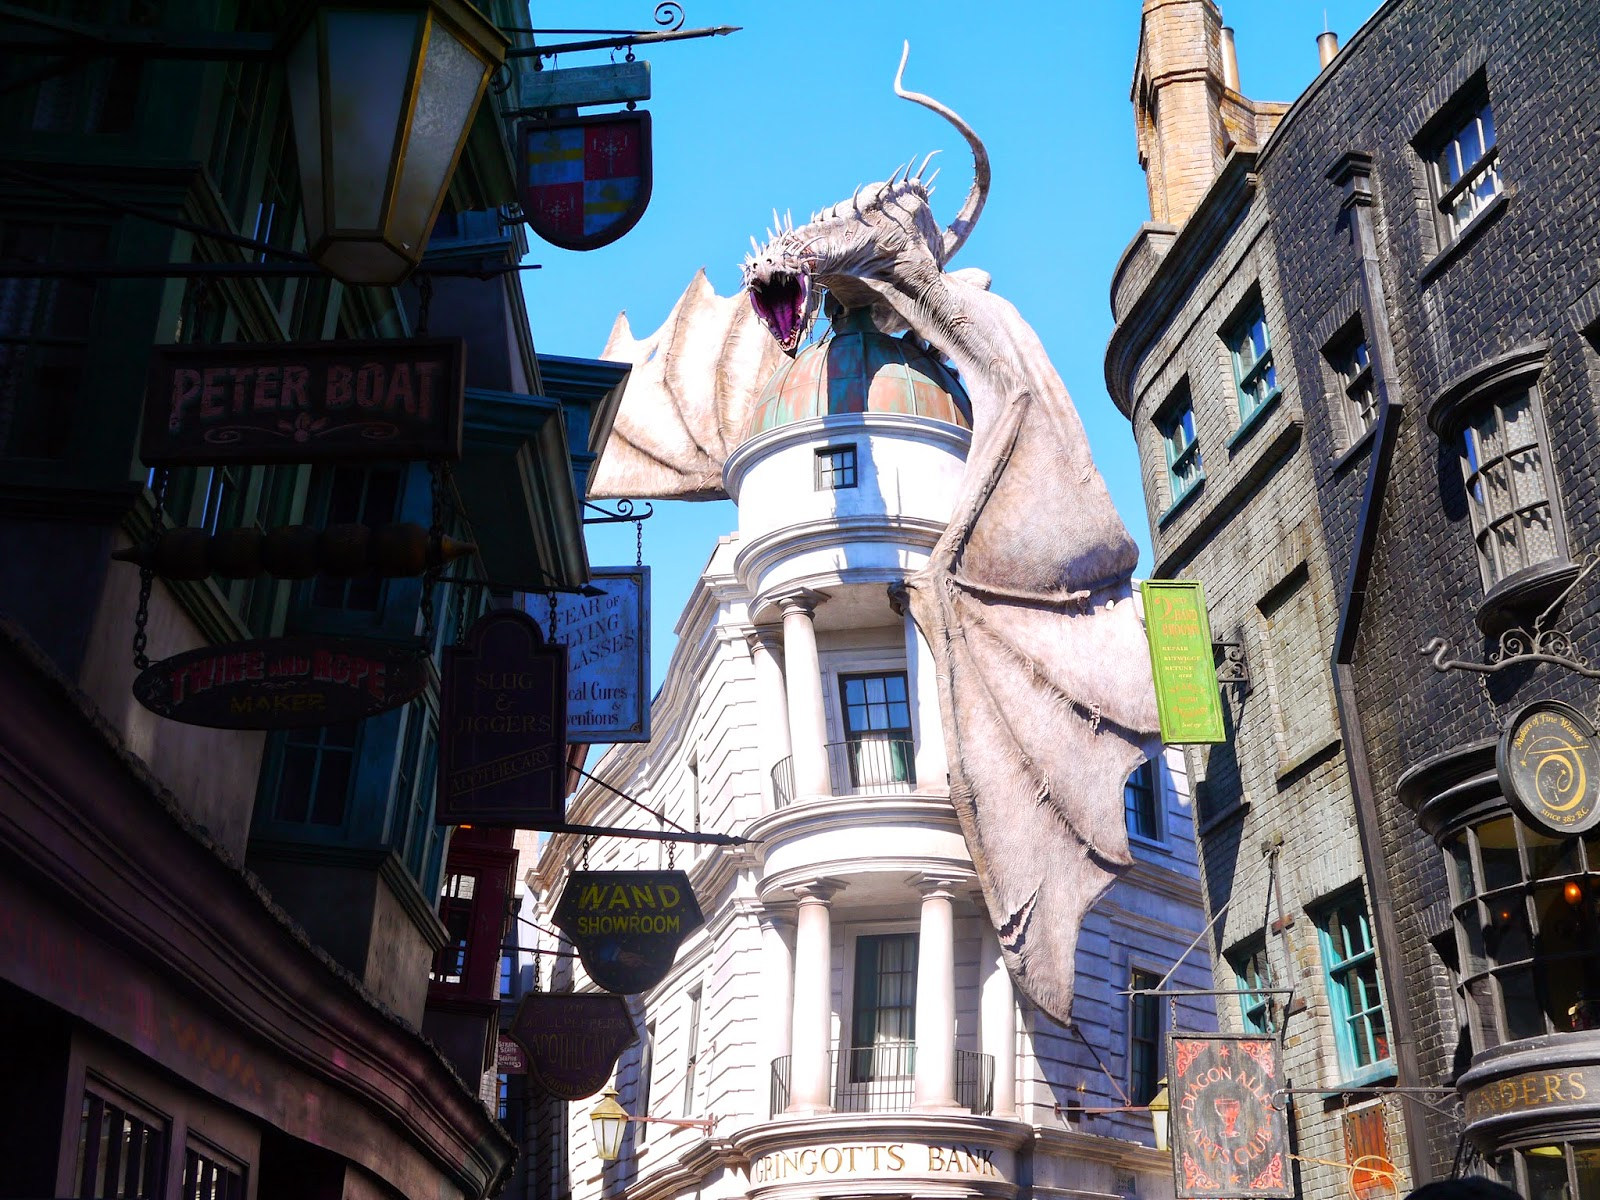 Diagon Alley at Universal Studios